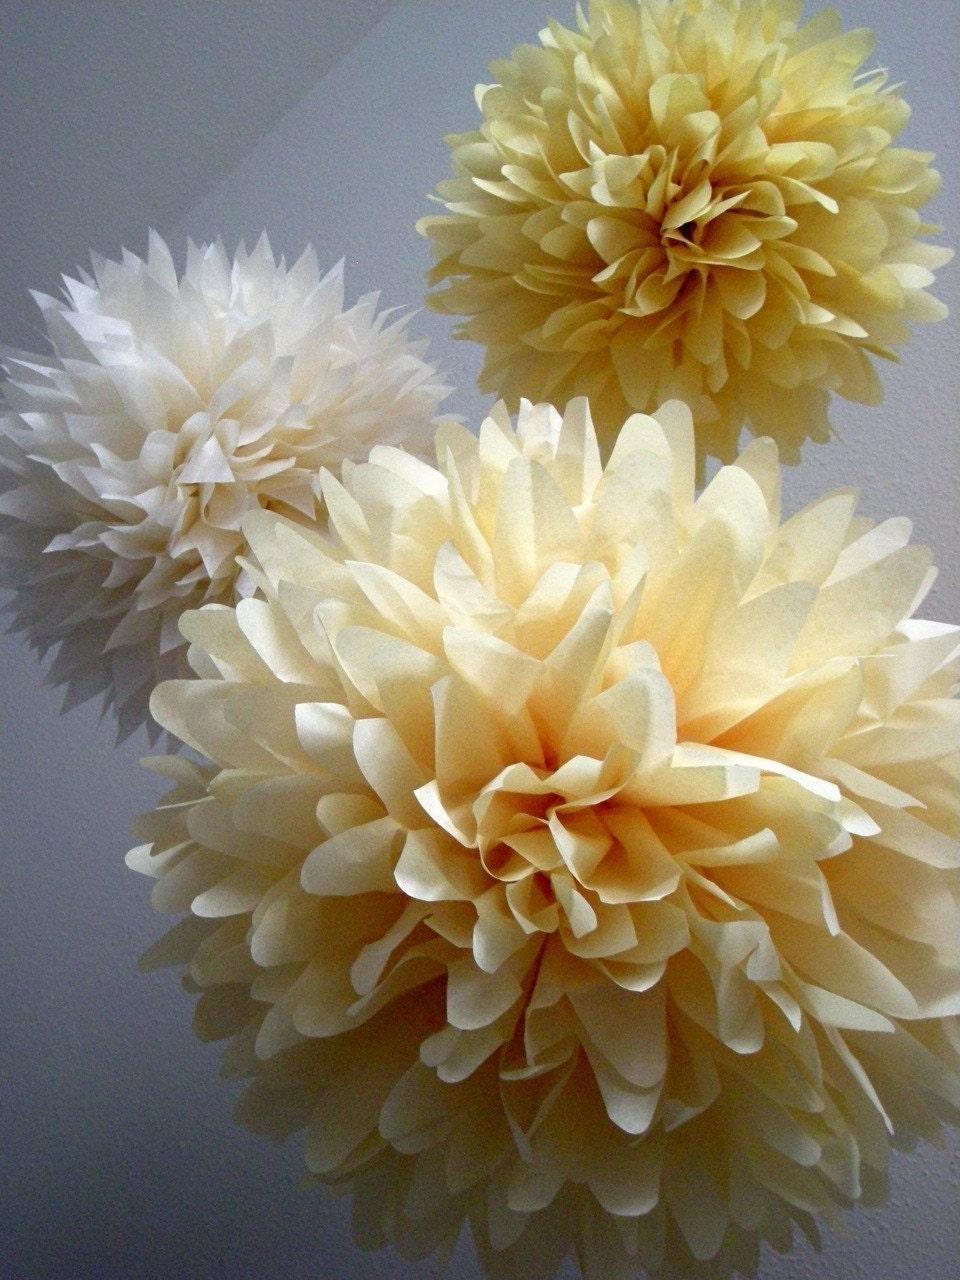 Pom Pom Decorations Vanilla 3 Tissue Paper Pom Poms Diy Wedding Decorations